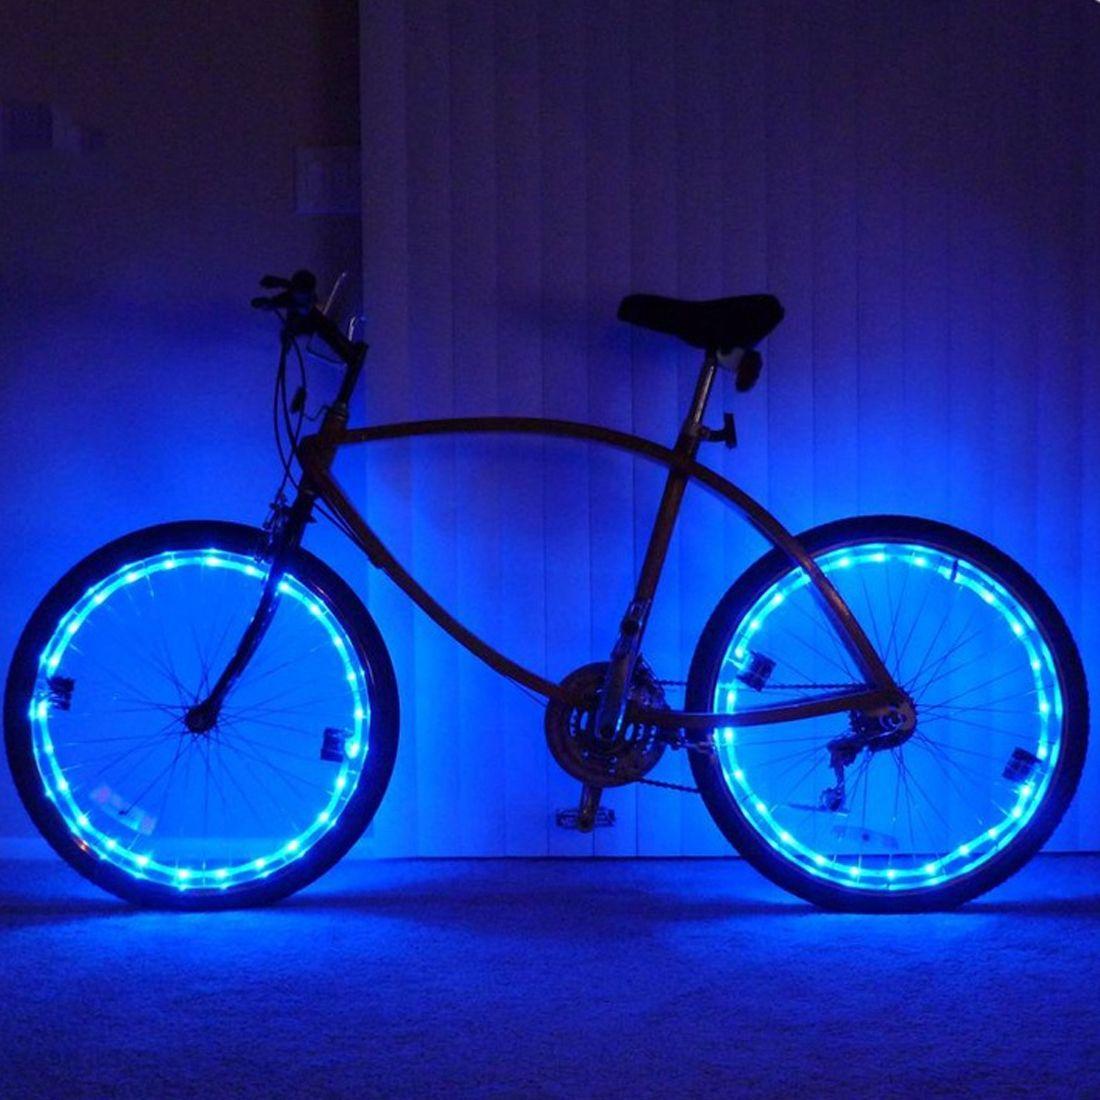 92af64ad6 Compre A Estrenar 20 LED Luces De La Bicicleta Luz De Bicicleta De Montaña  Ciclismo Spoke Rueda De La Lámpara Accesorios De Bicicleta Luces LED  Bicicleta A ...